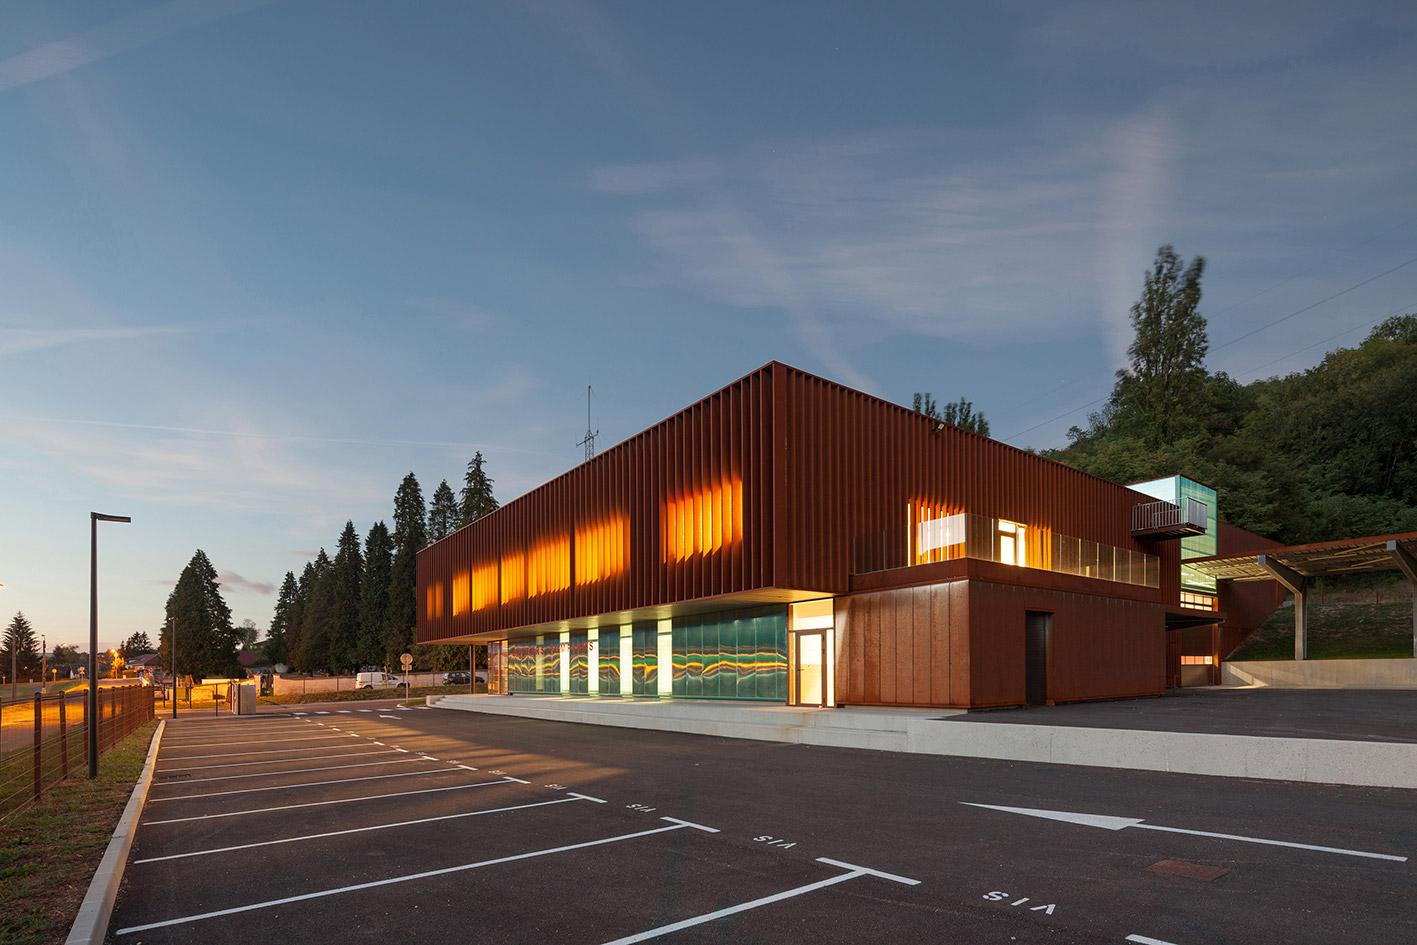 jerome-ricolleau-photographe-architecture-lyon-Composite-grenoble-sdis-caserne-pompiers-seyssel-12